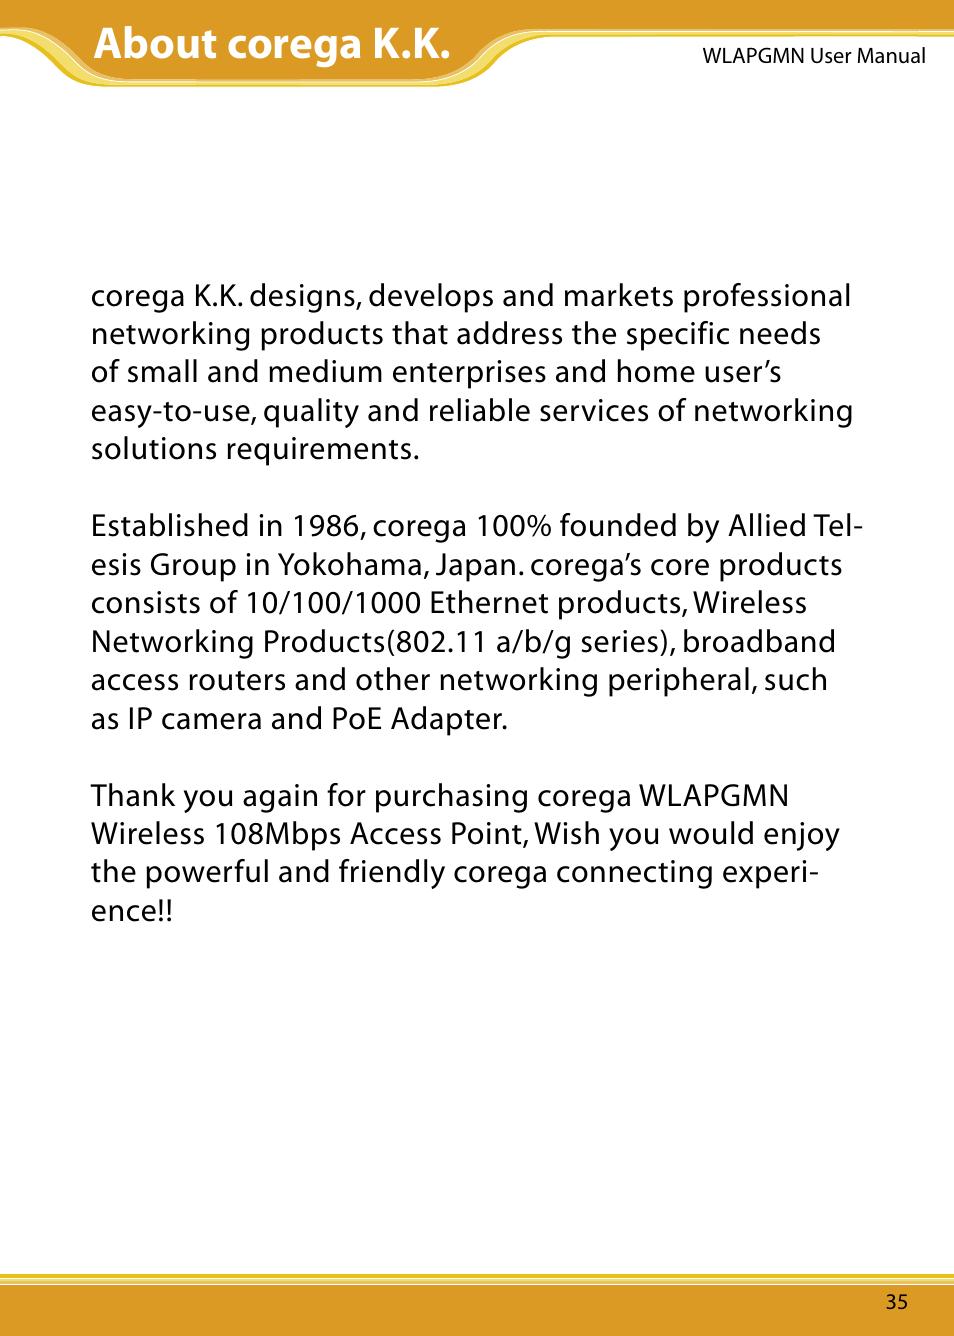 about corega k k corega cg wlapgmn user manual page 37 39 rh manualsdir com